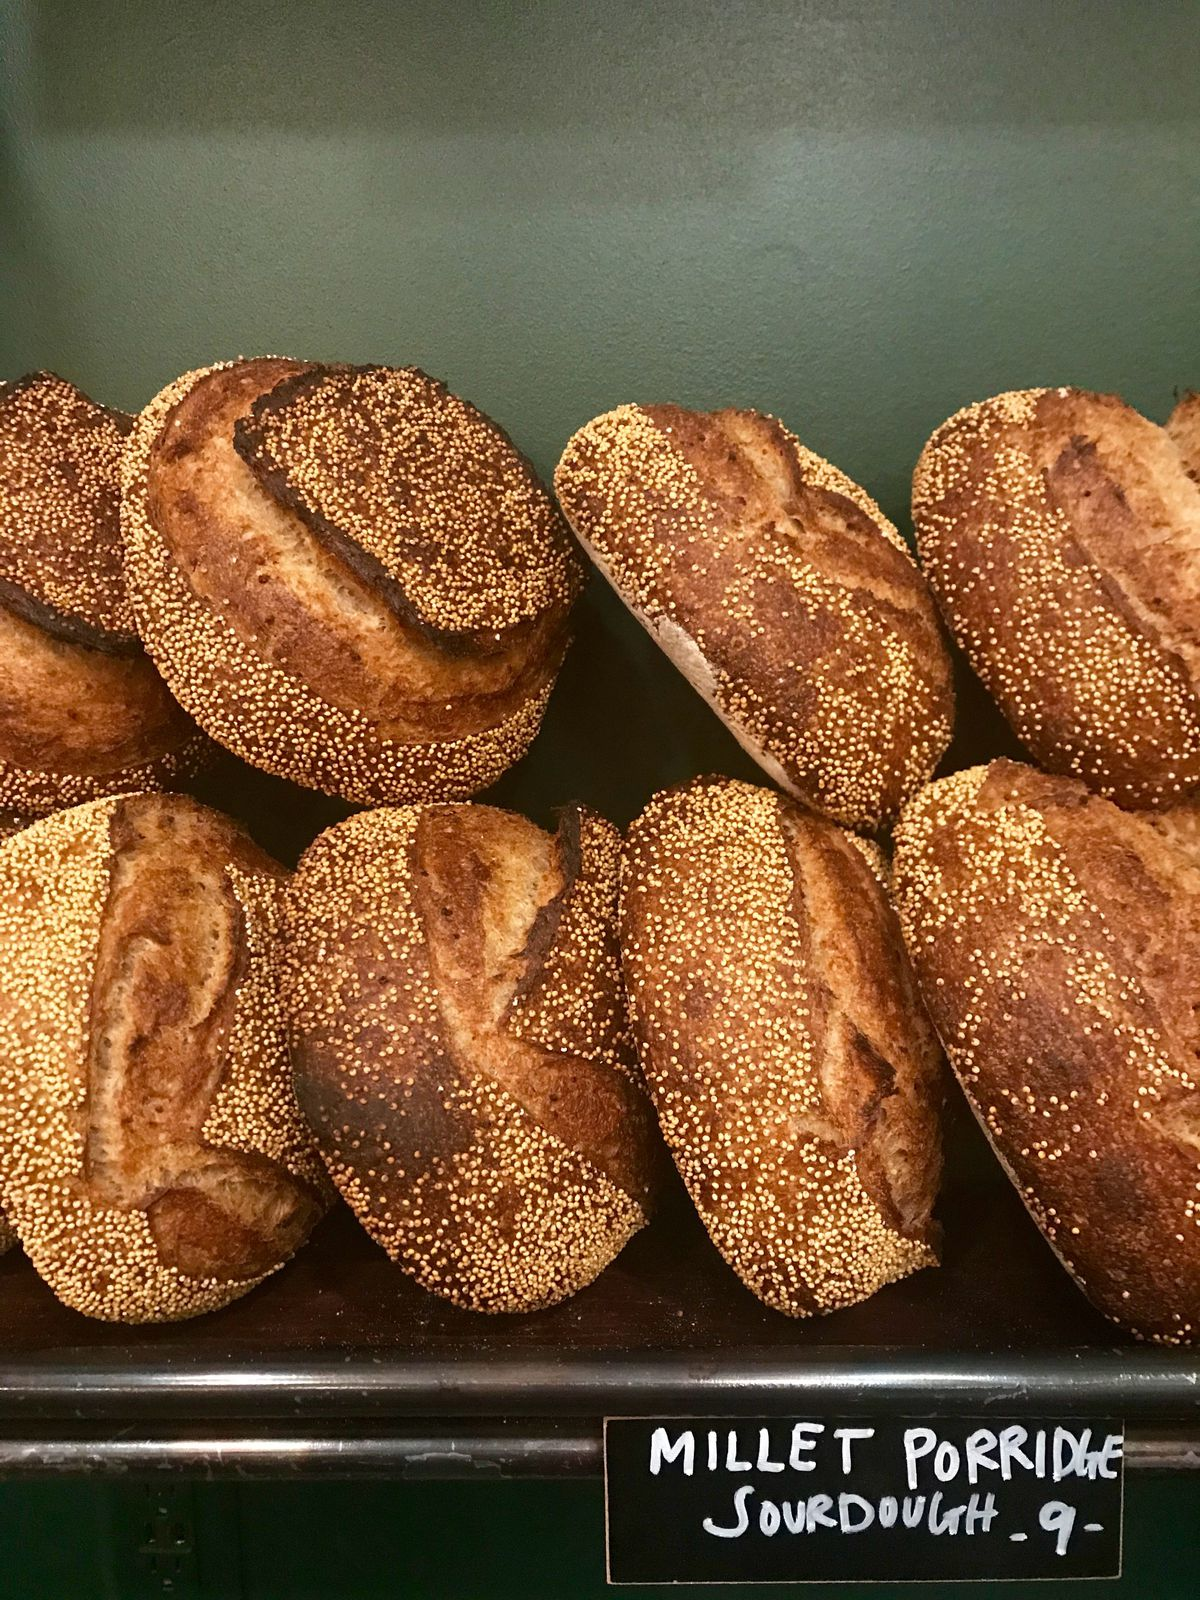 Two rows of millet porridge sourdough loaves at Evergreen Butcher and Baker in Kirkwood Atlanta